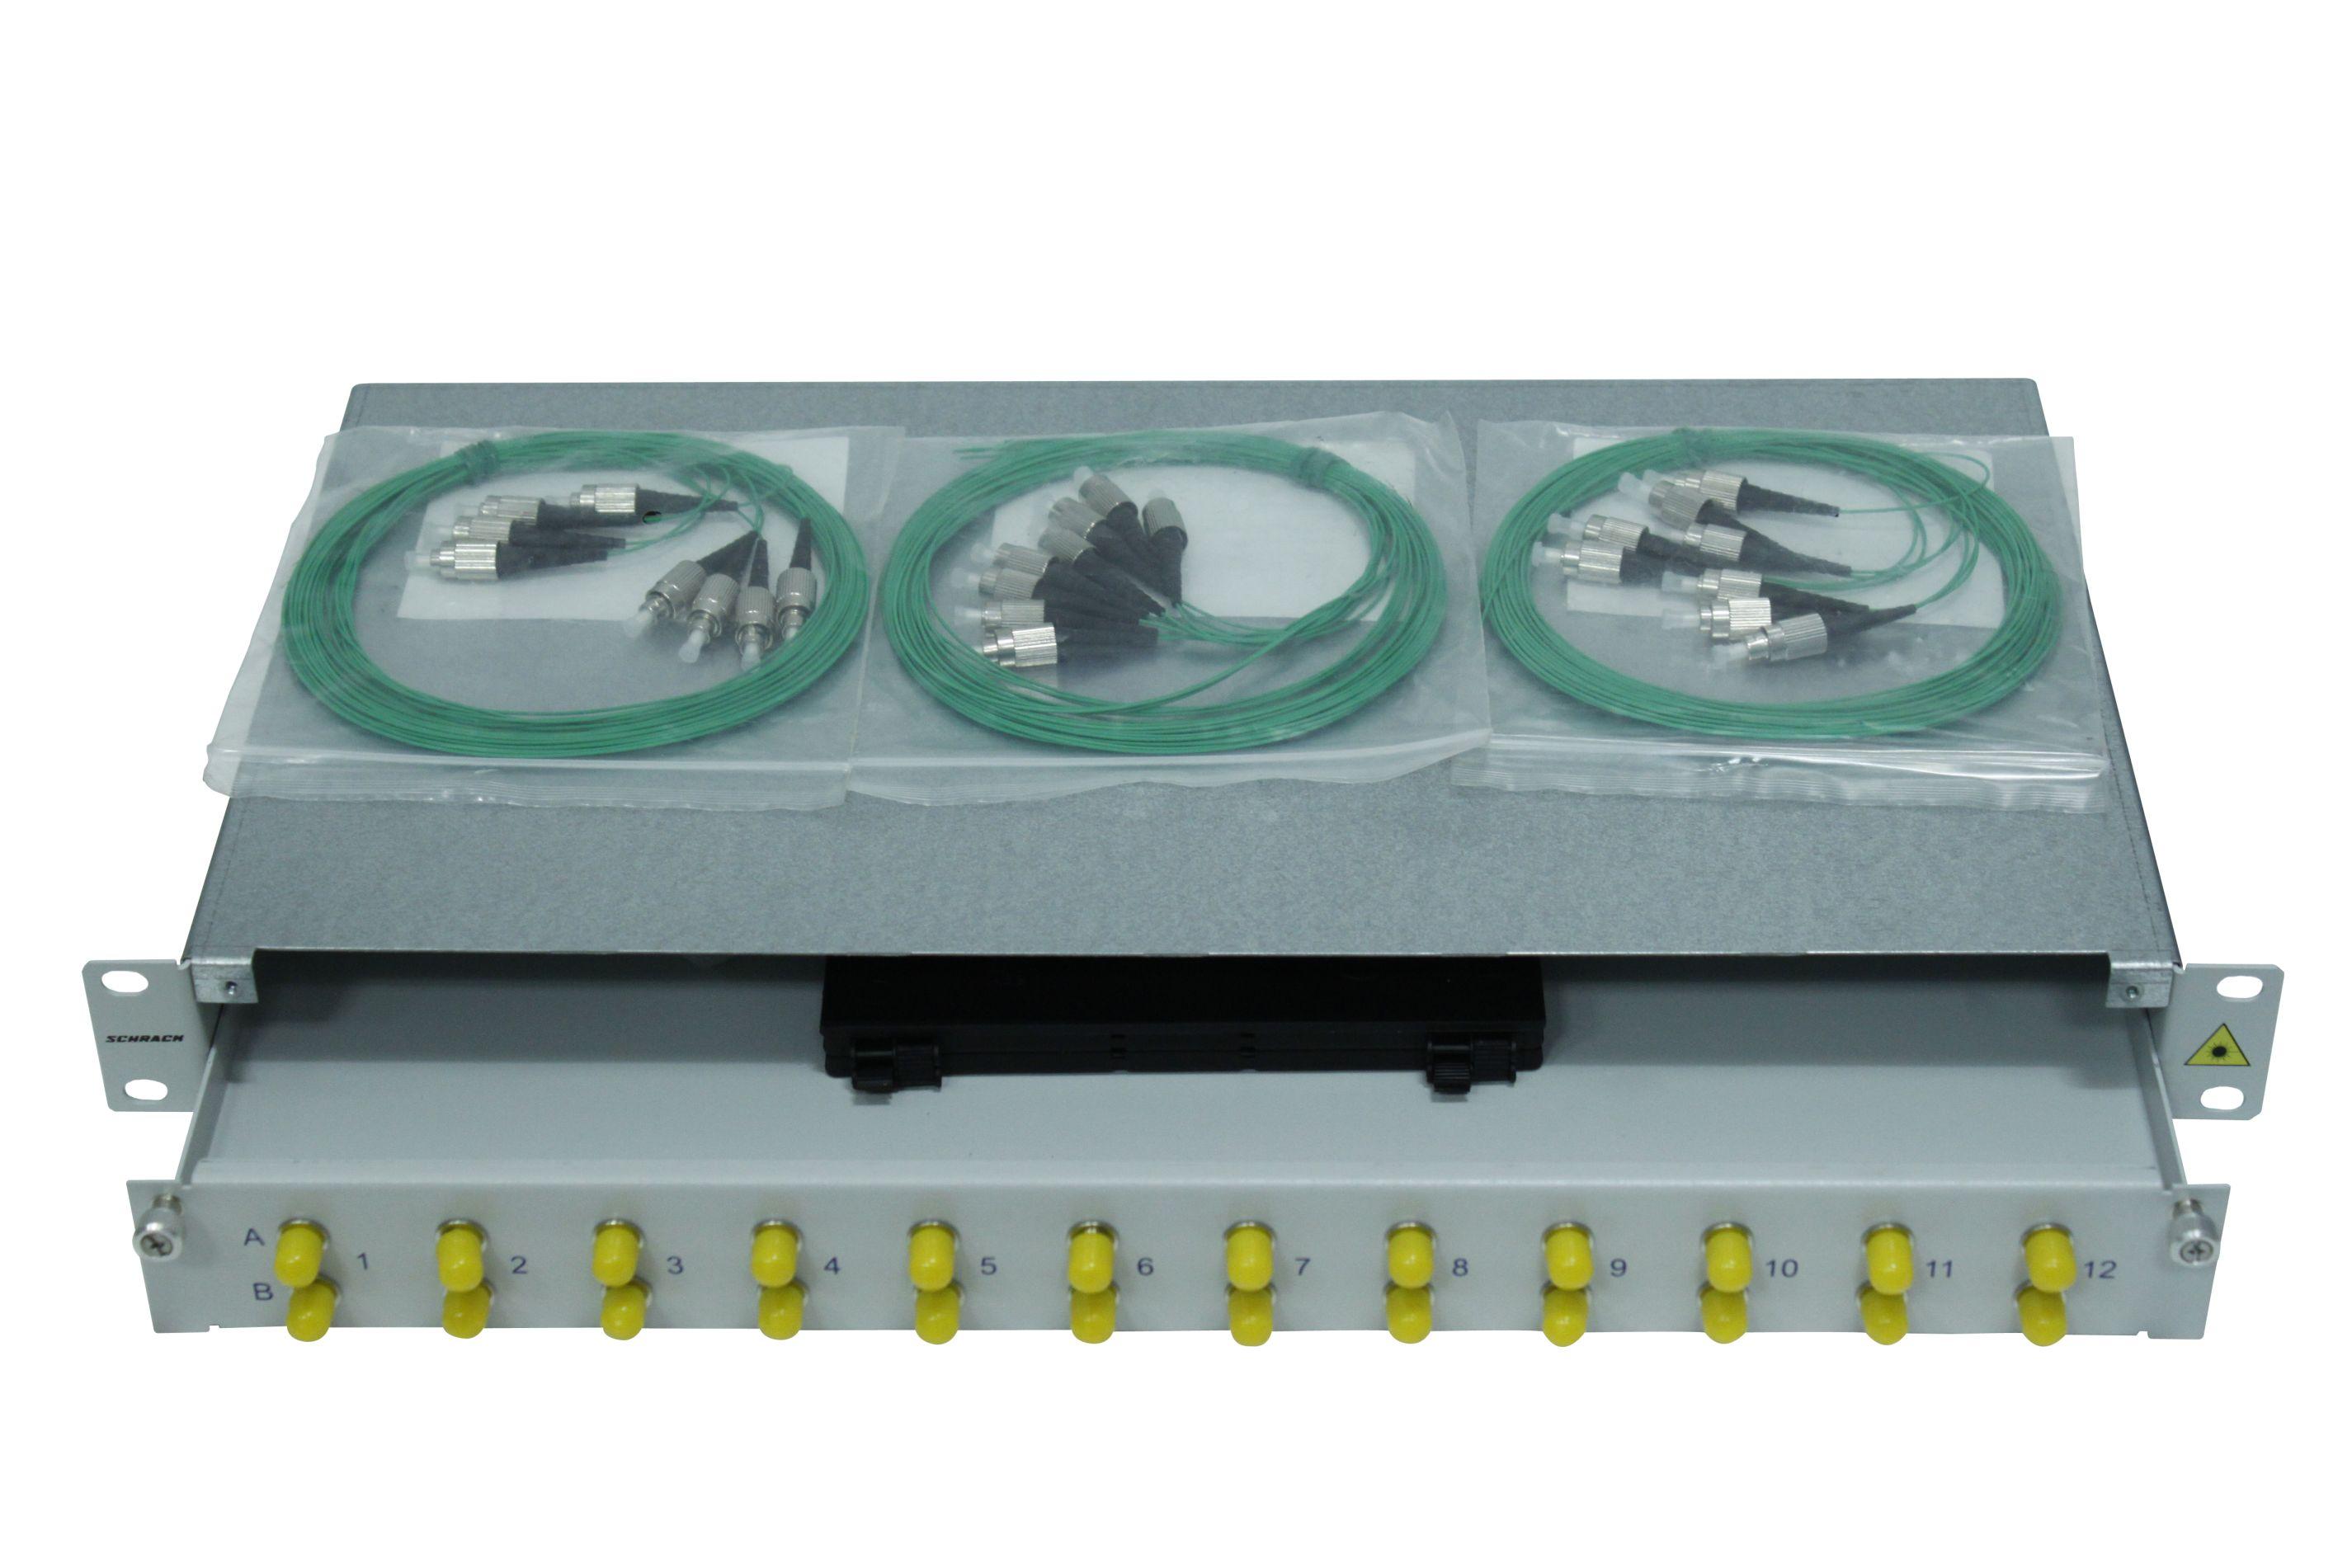 1 Stk LWL Spleißbox, 16Fasern, FC, 62,5/125µm OM1, 19, 1HE HSELS166FG